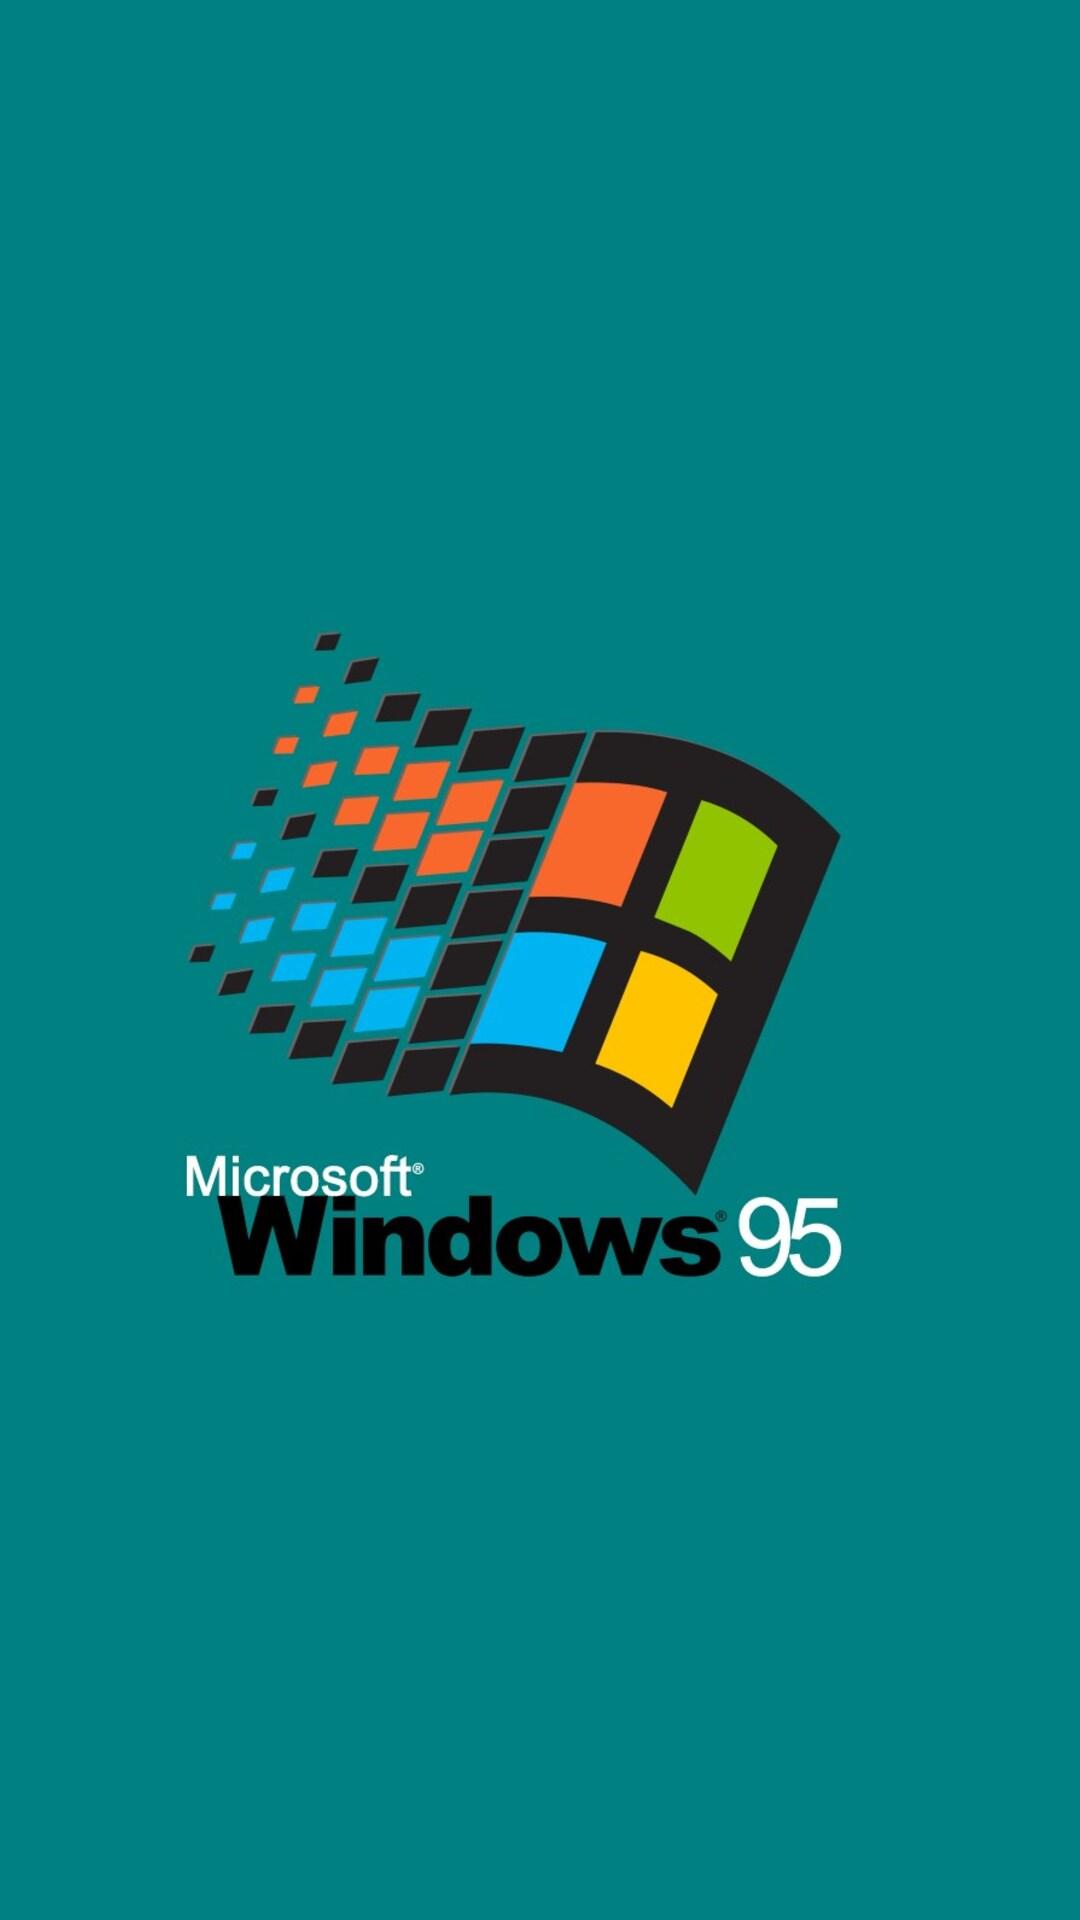 download windows 95 hd 4k wallpapers in 1080x1920 screen